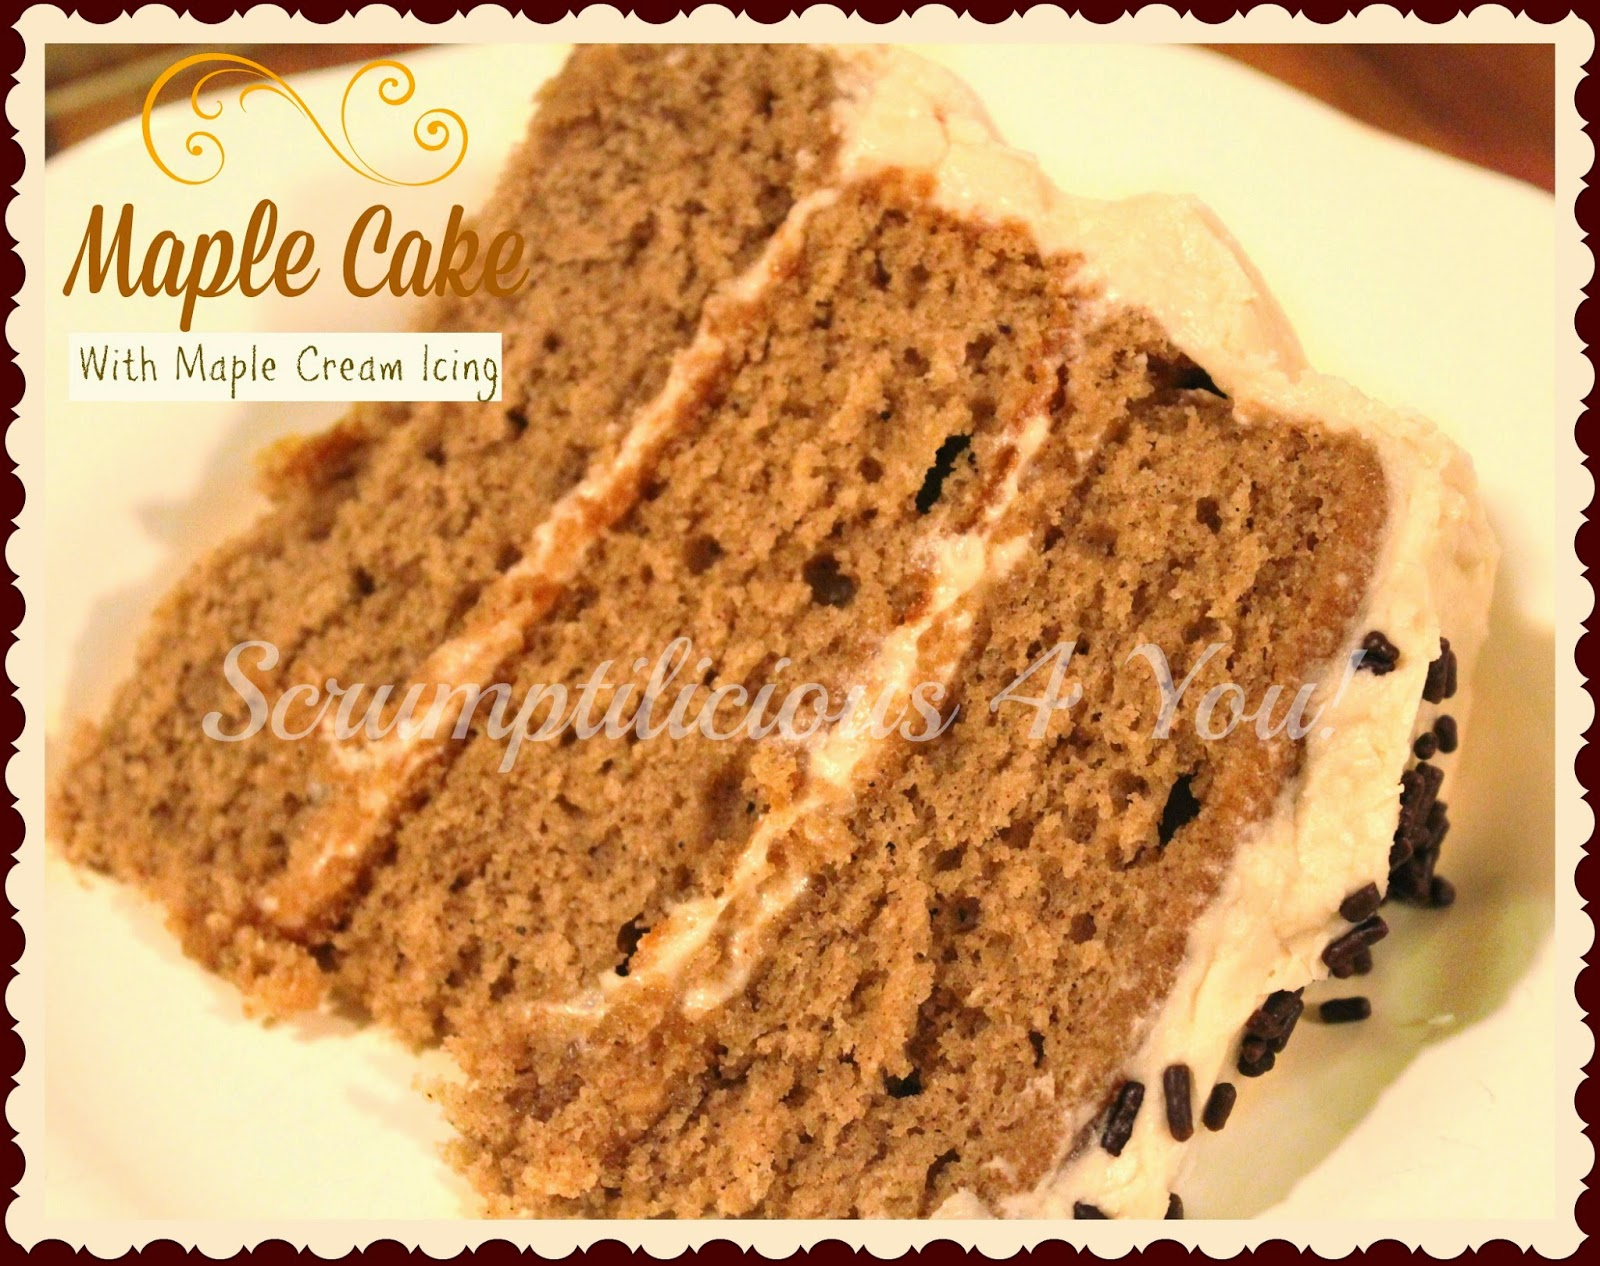 Cake Recipes Using Maple Flavoring